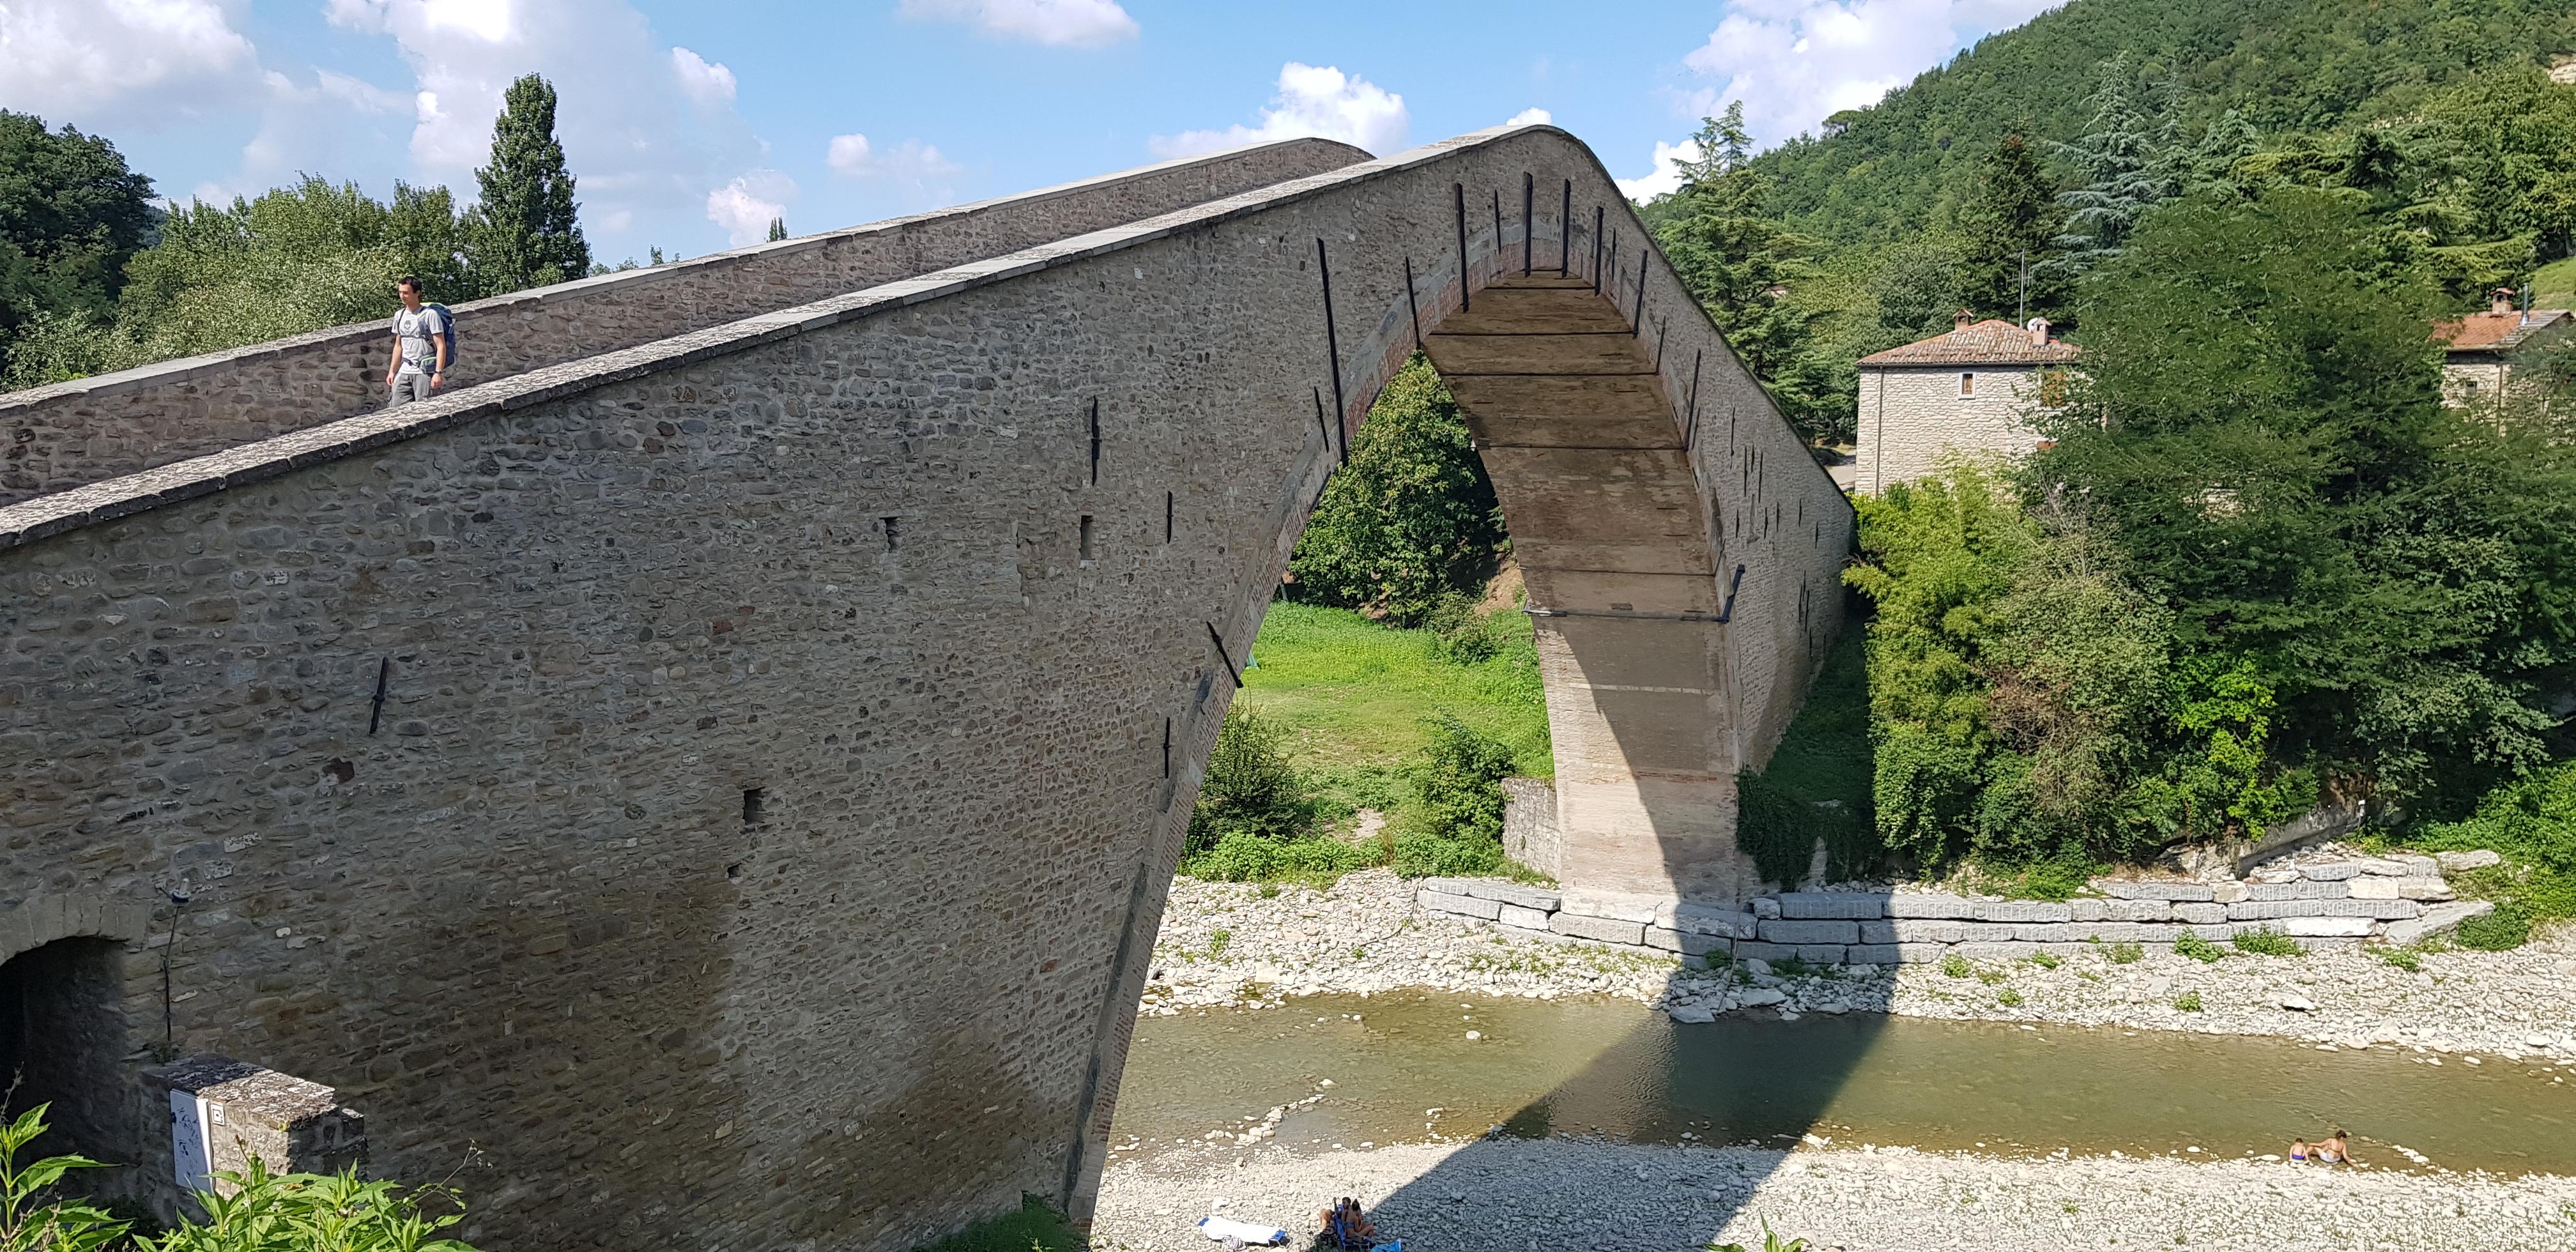 Cultuurhistorisch erfgoed in Castel del Rio.